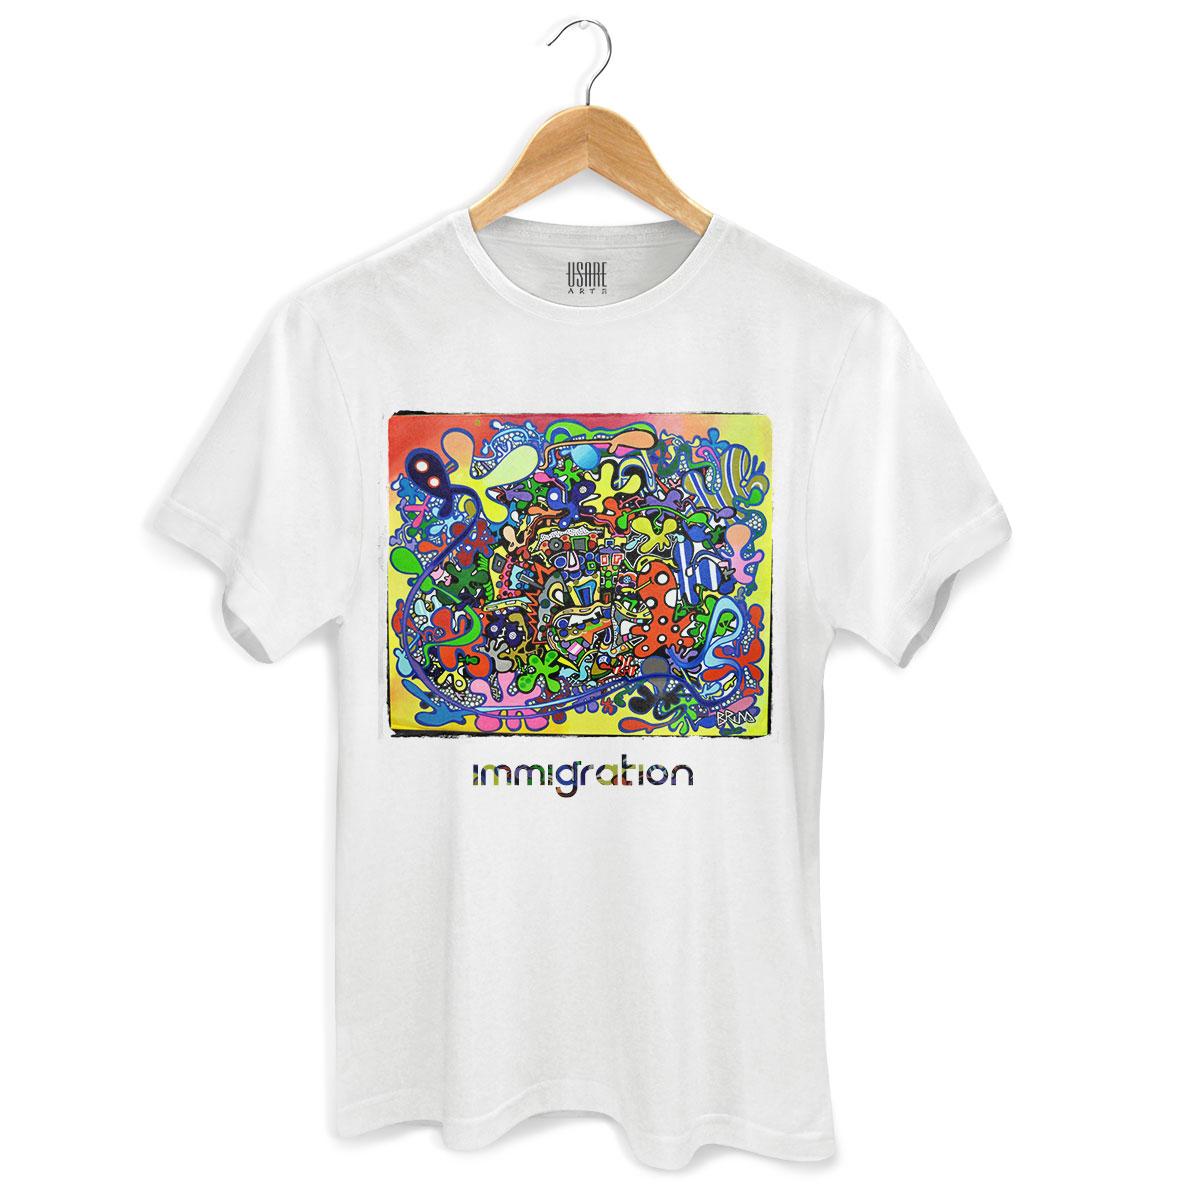 Camiseta Masculina Bruna Immigration